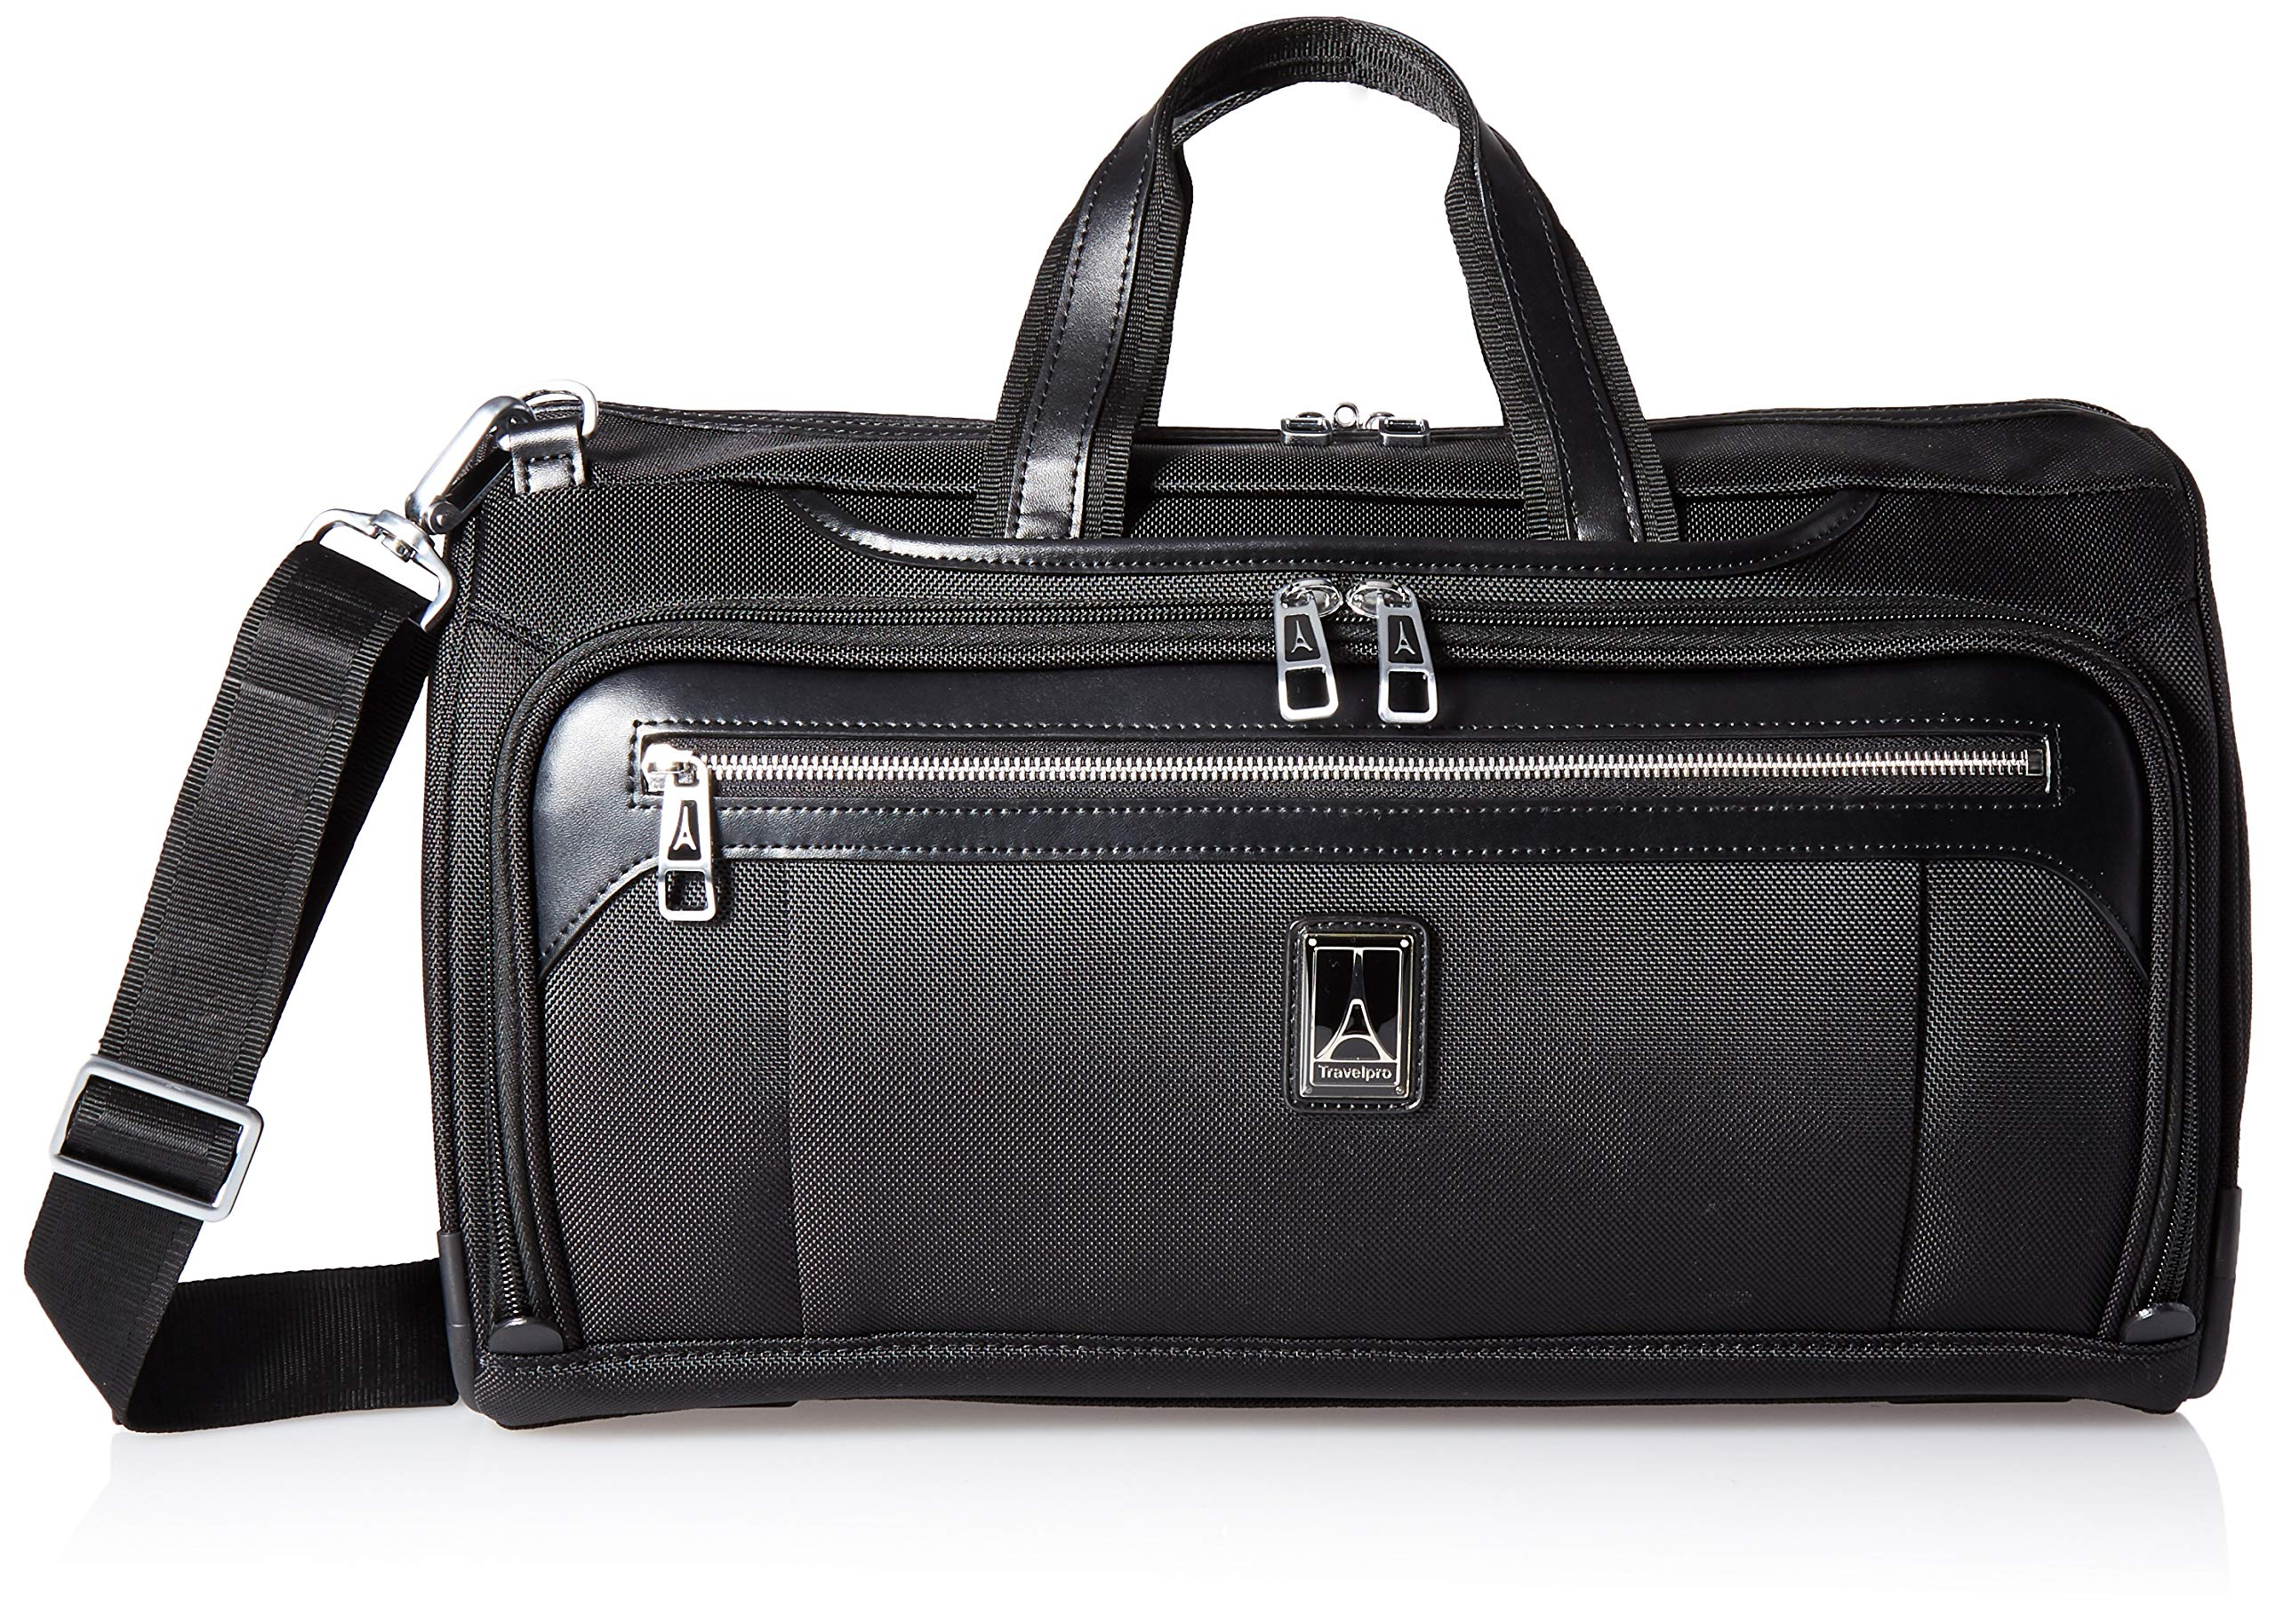 Travelpro Luggage Platinum Elite 18'' Carry-on Regional Duffel Bag, Shadow Black, One Size